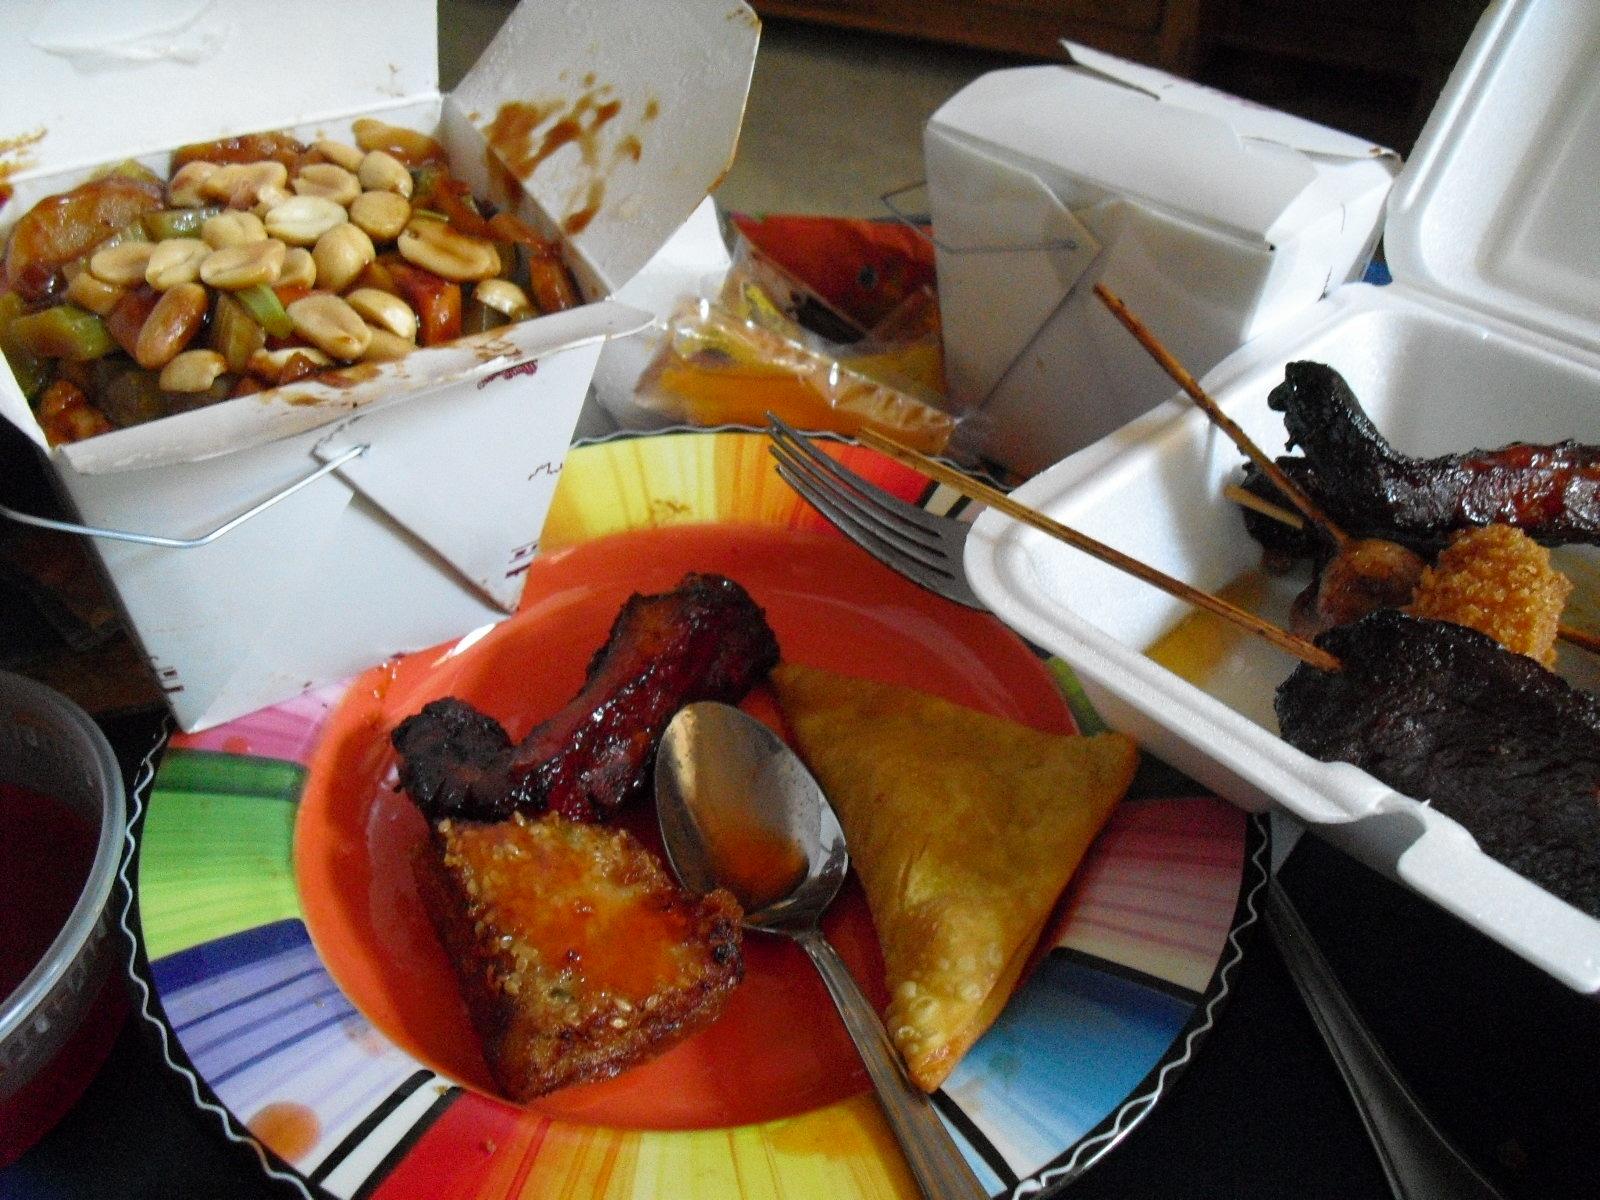 291a97fe79fa554cf541_Chinese_food_-Schewuan_Shrimp___pupu.jpg